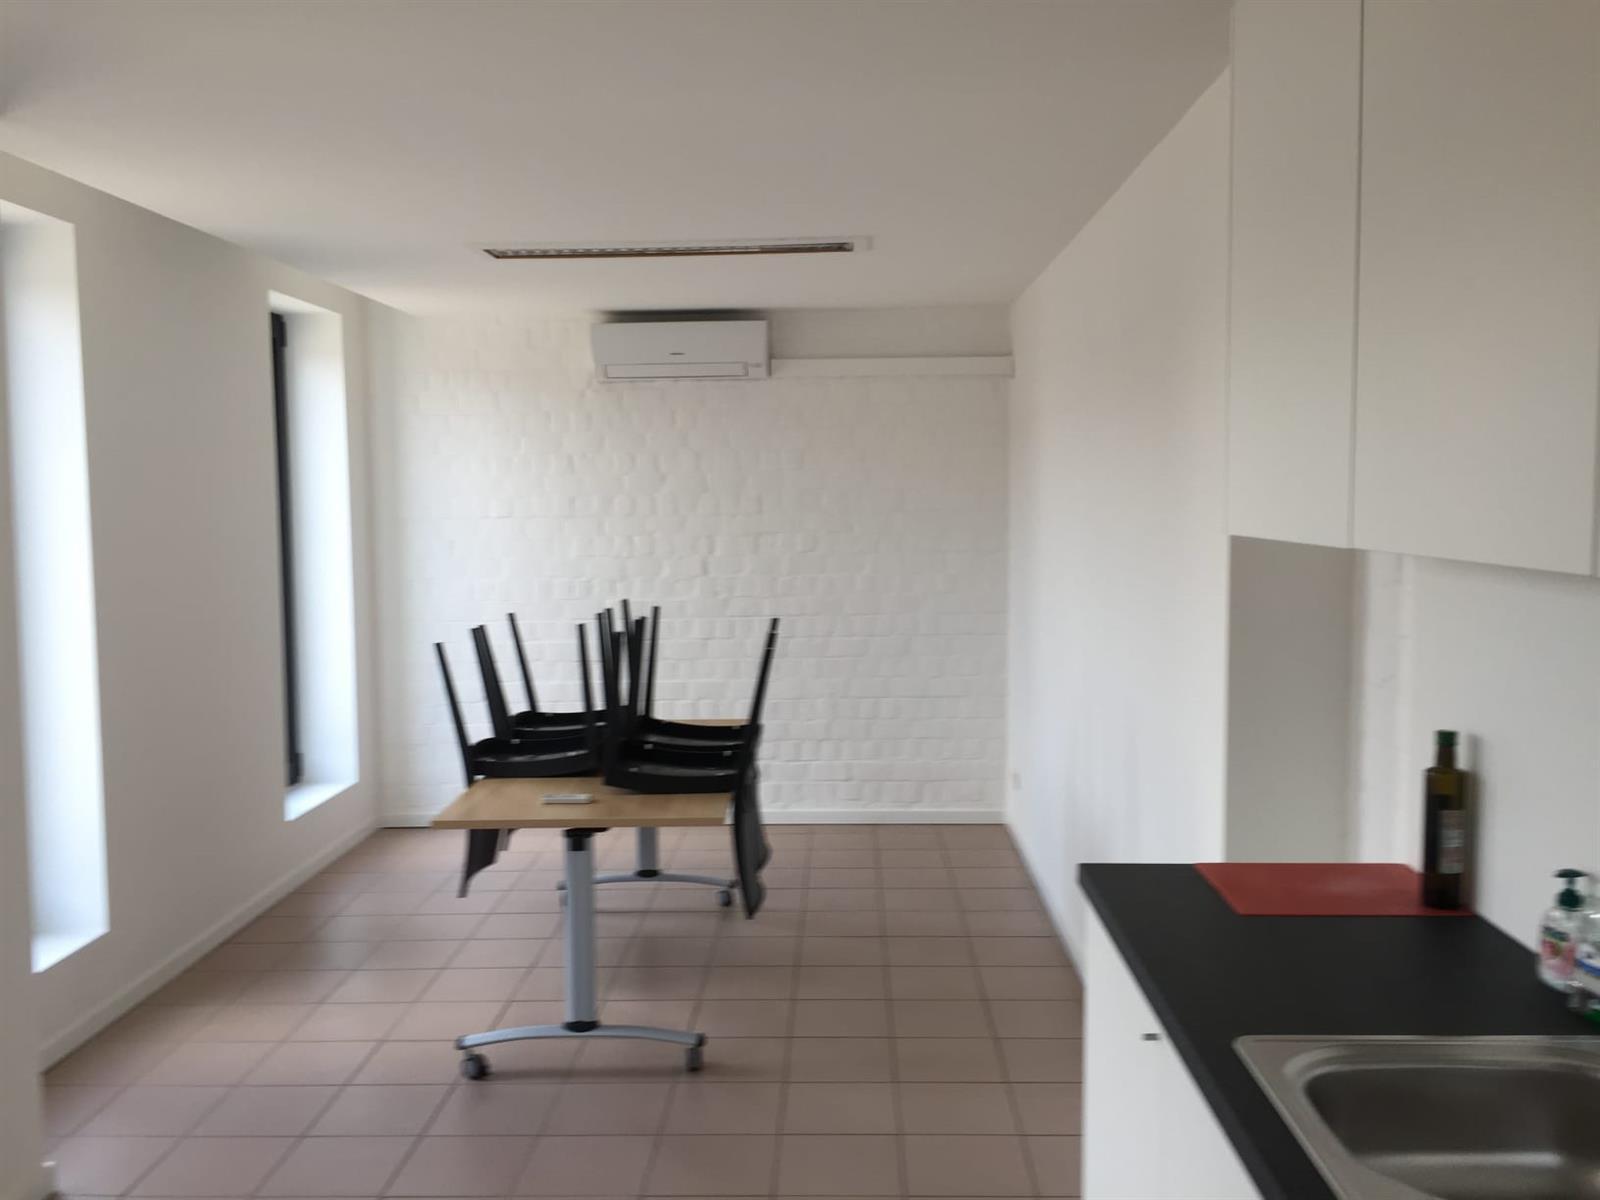 kantoor te huur K003 - Middelmolenlaan 96, 2100 Antwerpen Deurne, België 8